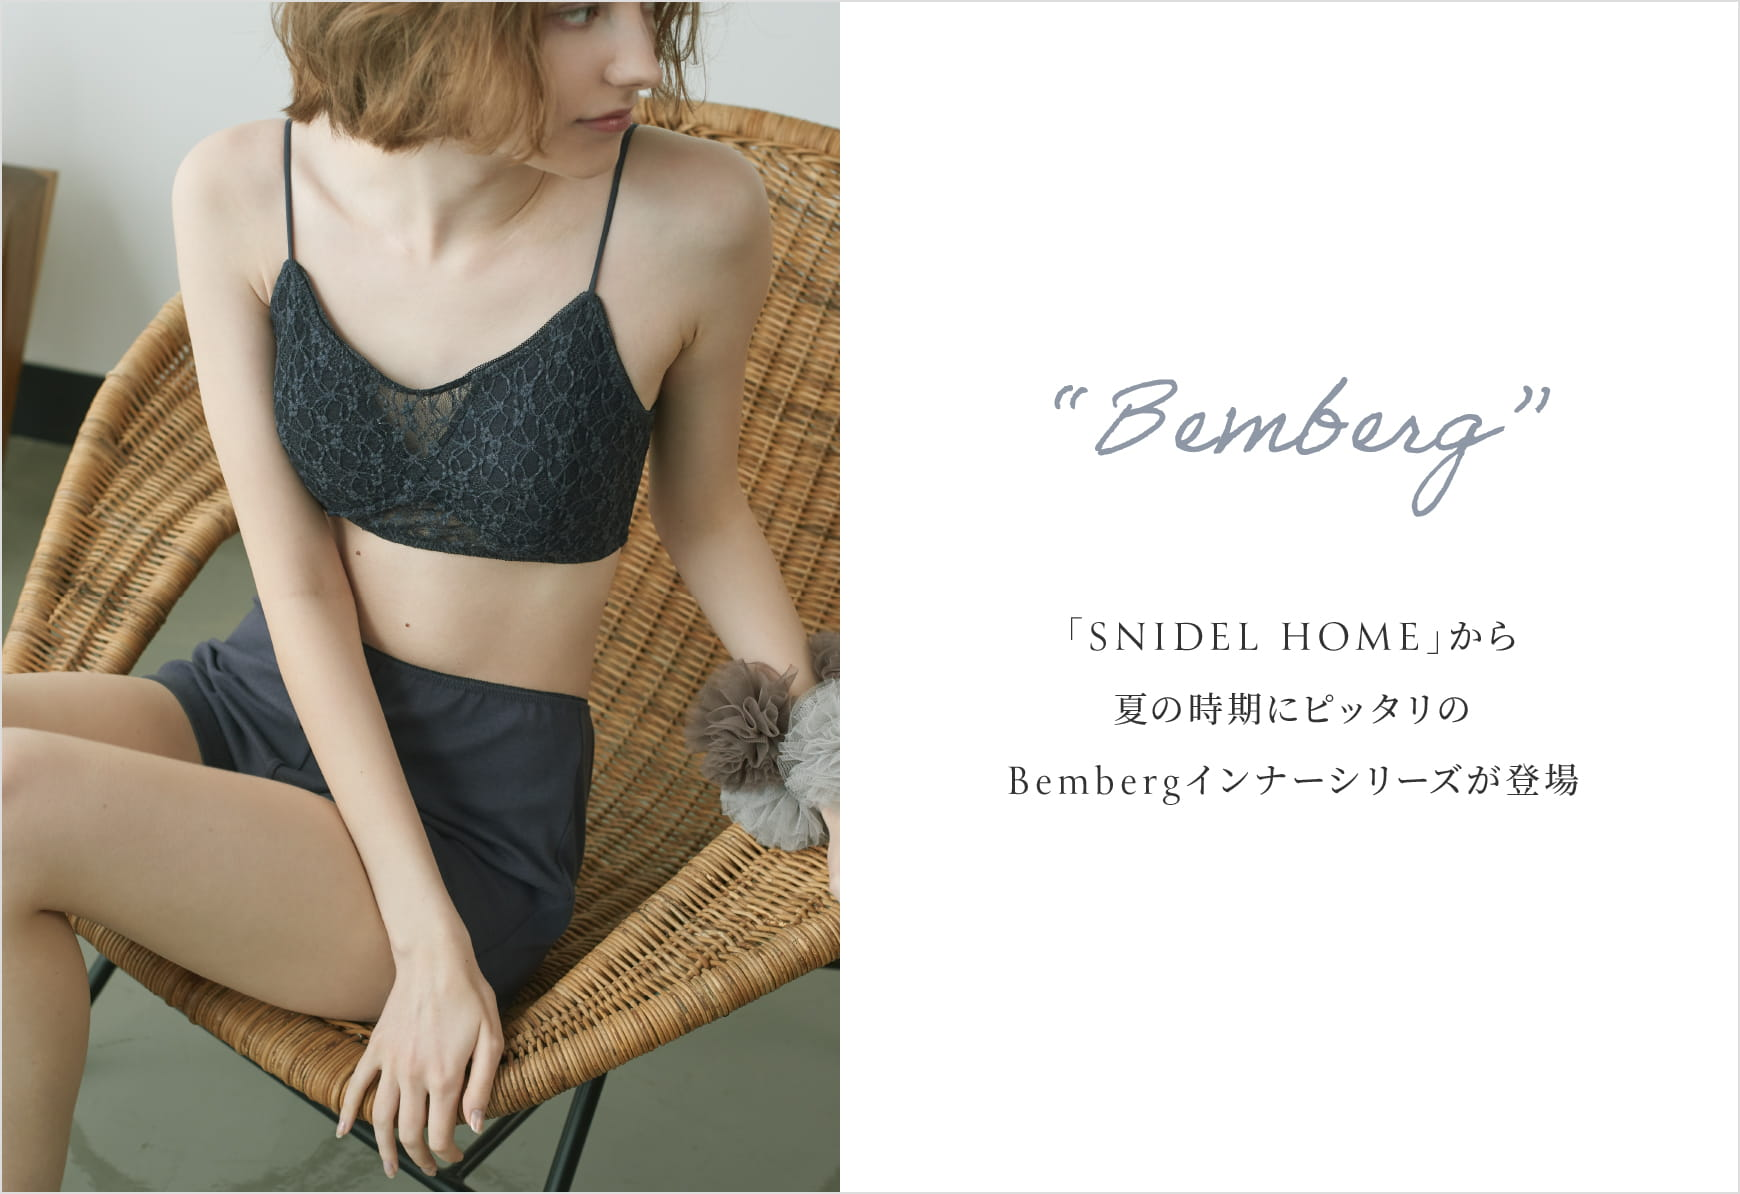 「SNIDEL HOME」から 夏の時期にピッタリの Bembergインナーシリーズが登場